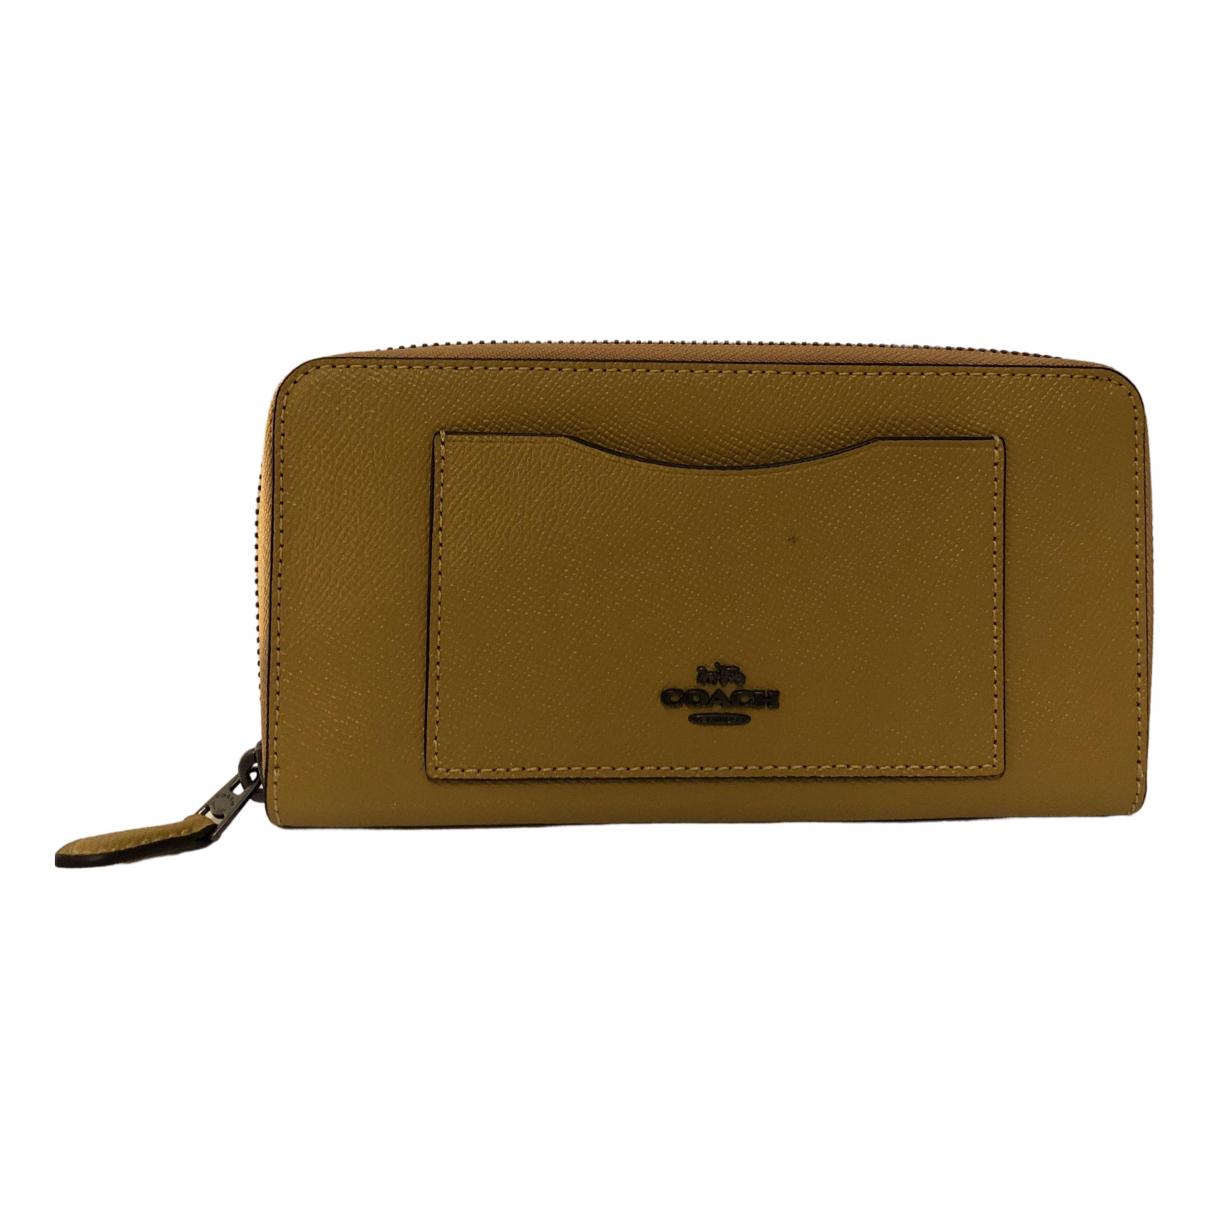 Coach N Leather wallet for Women N